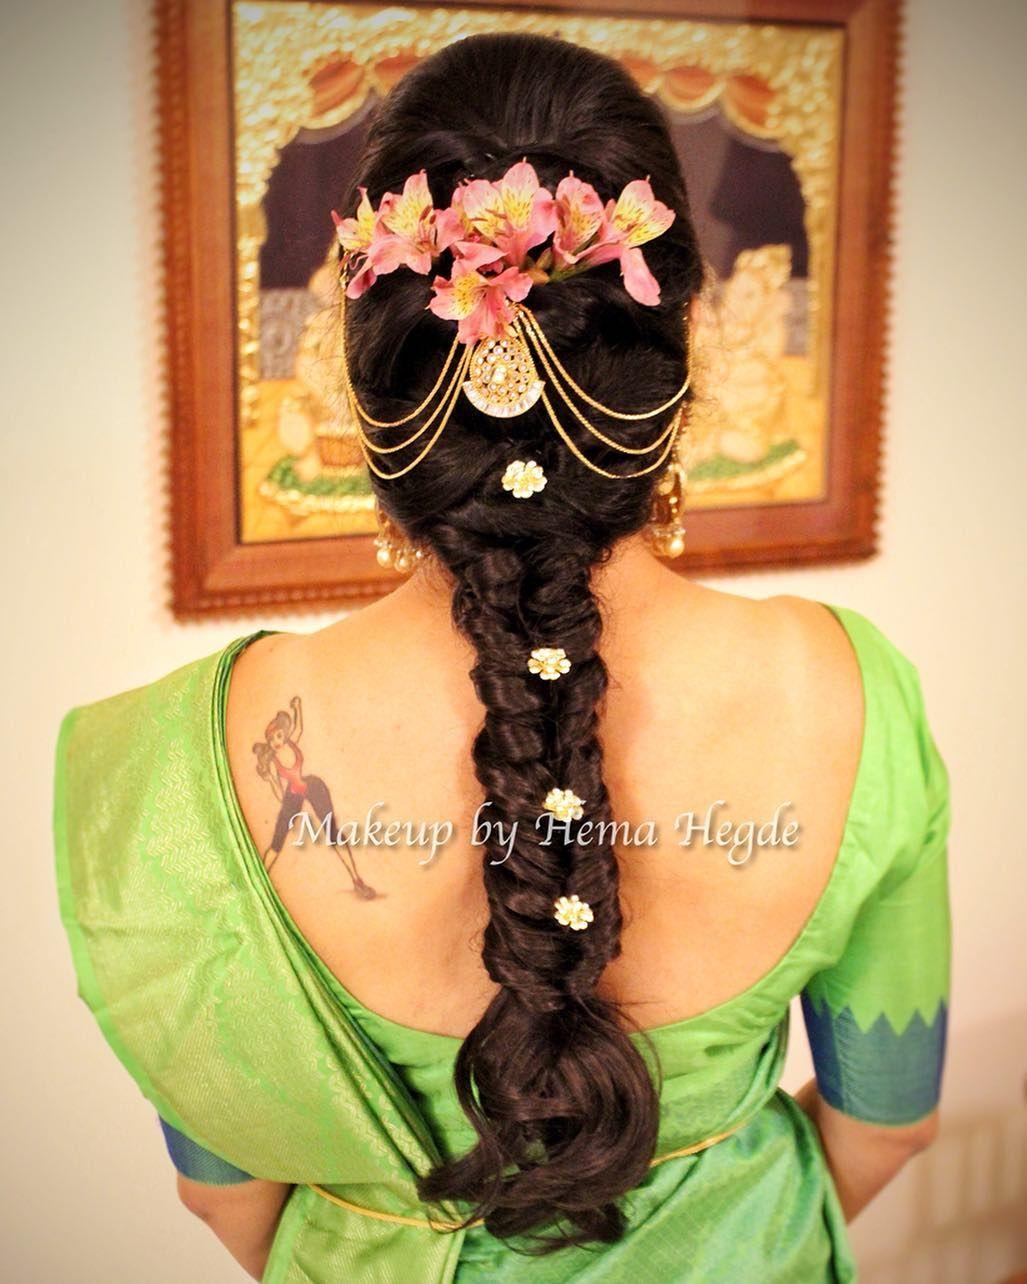 Bridal Hair Bridal Hairstyles Indian Bridal Hairstyles Bridal Hairstyles South Indian South Ind Bridal Hair Buns Bridal Hairstyle For Reception Hair Styles